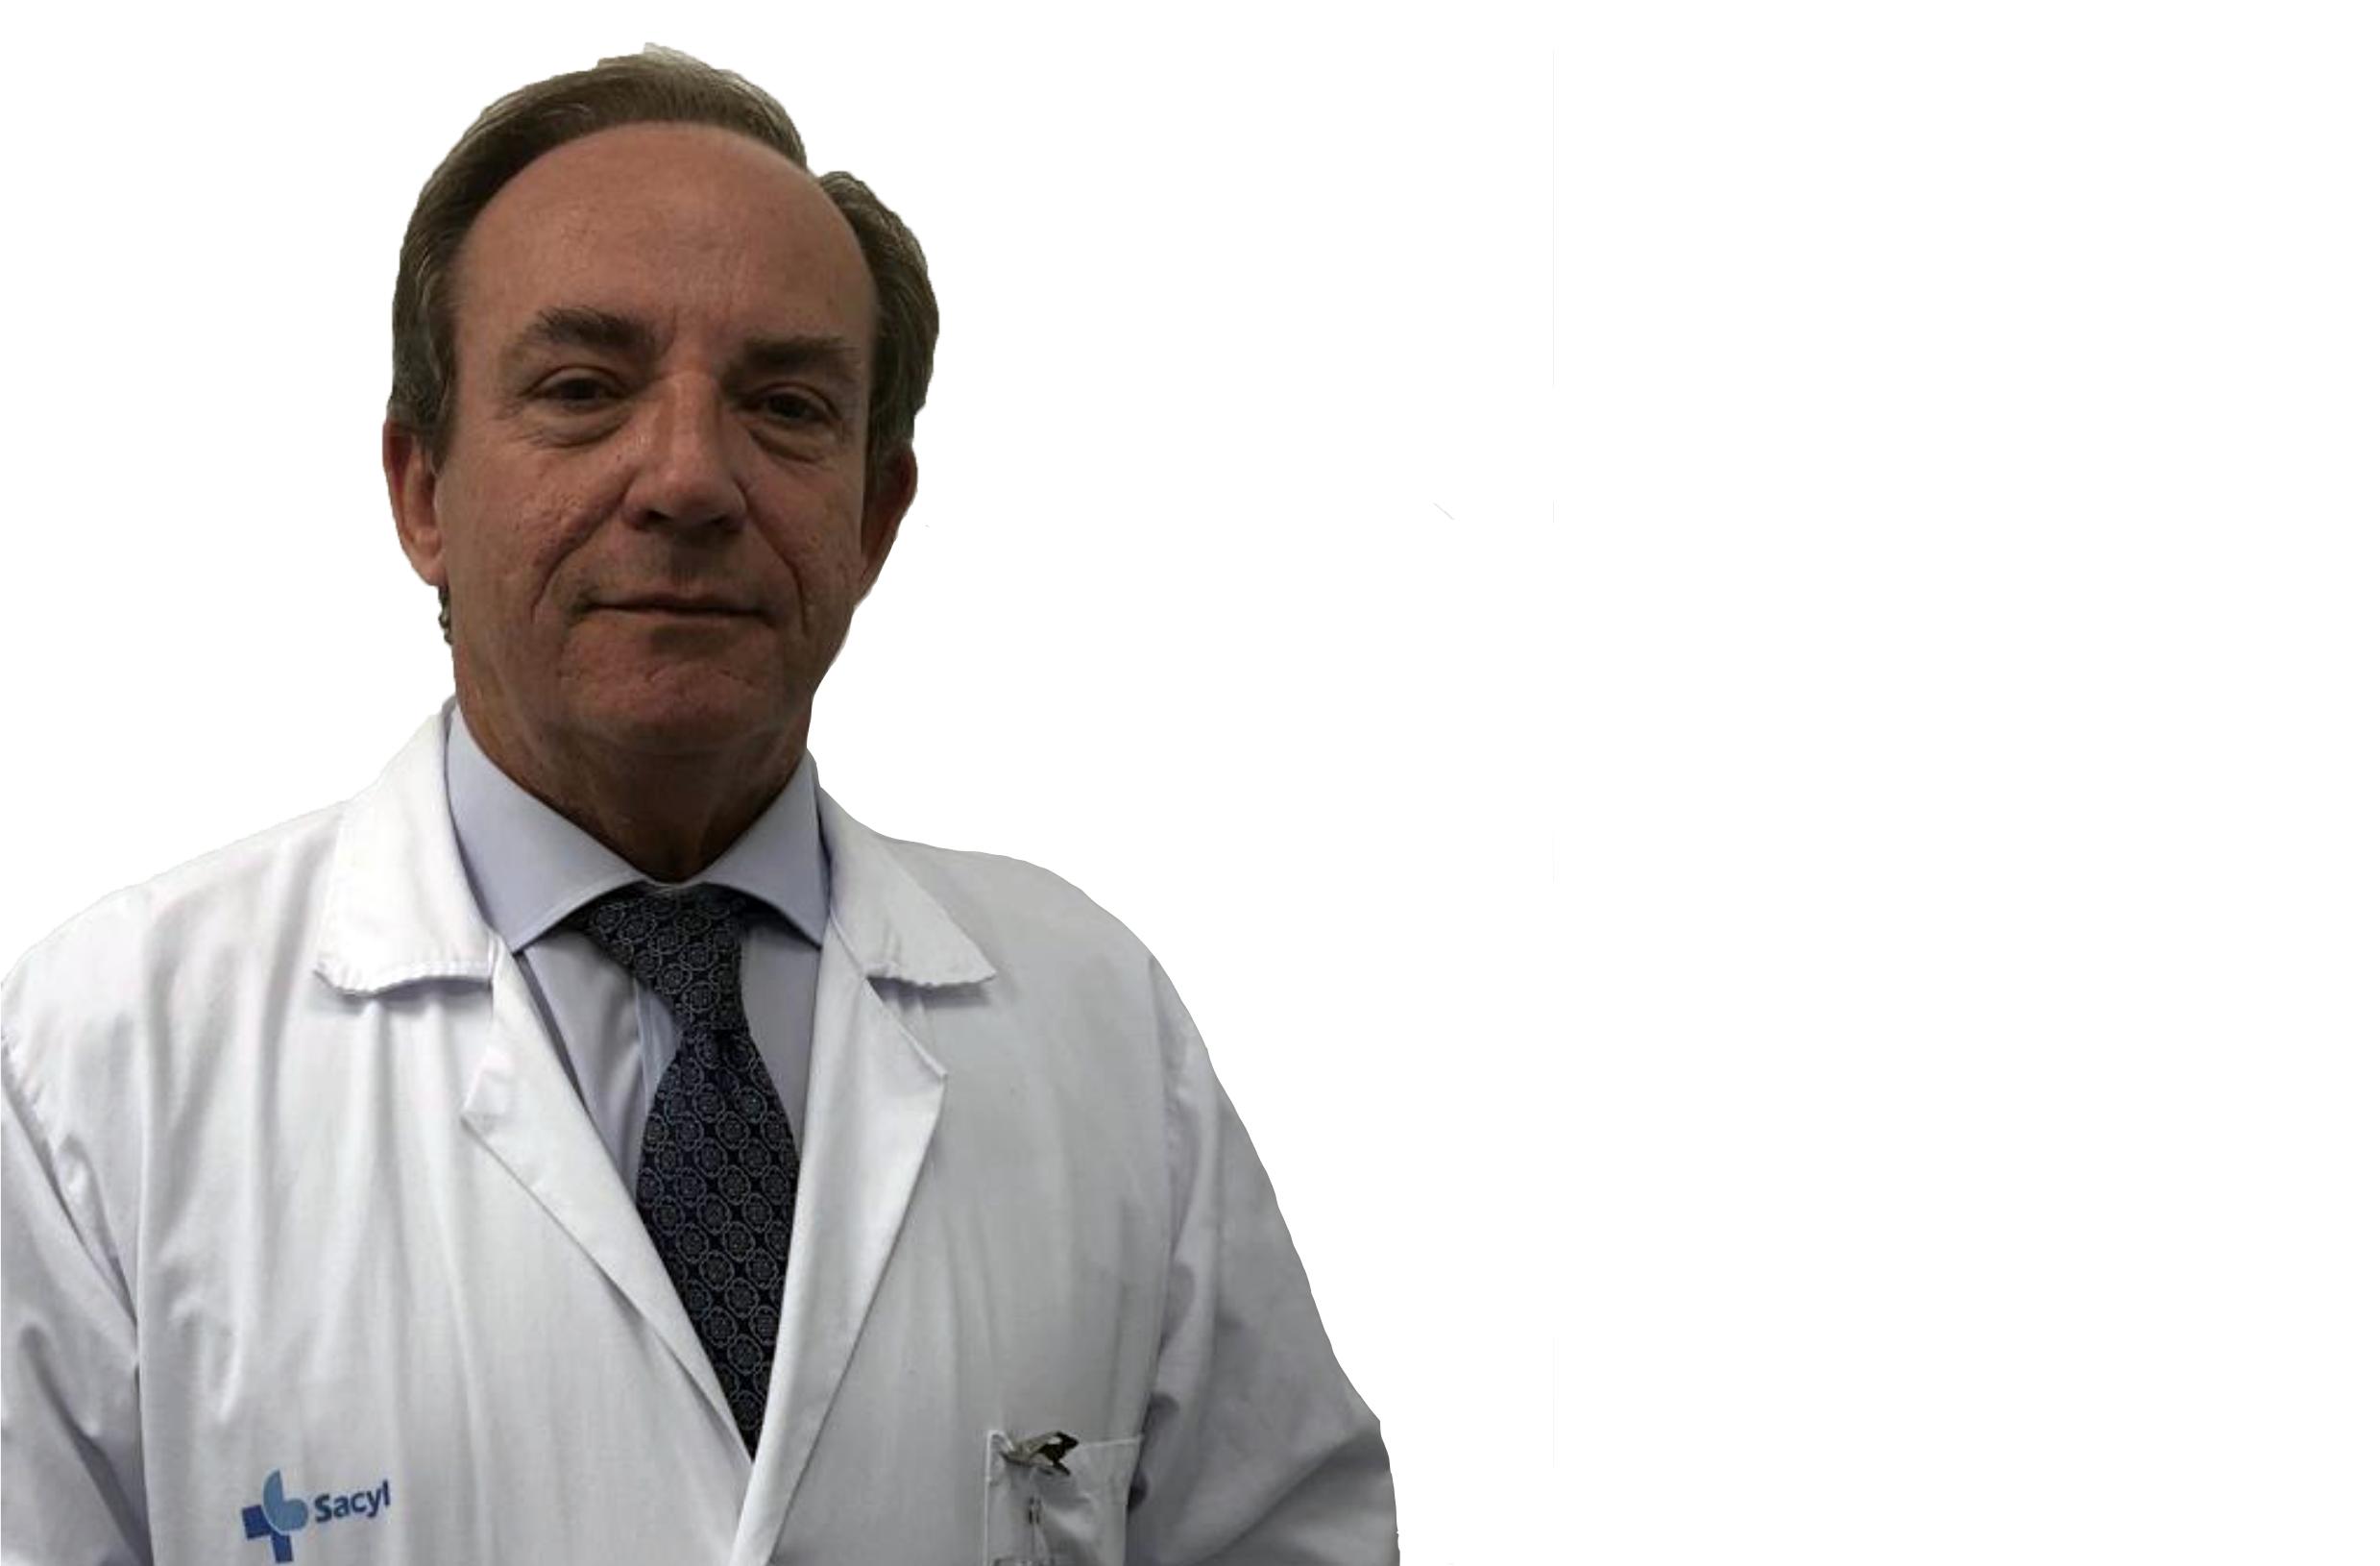 Dr. José Javier Castrodeza Sanz